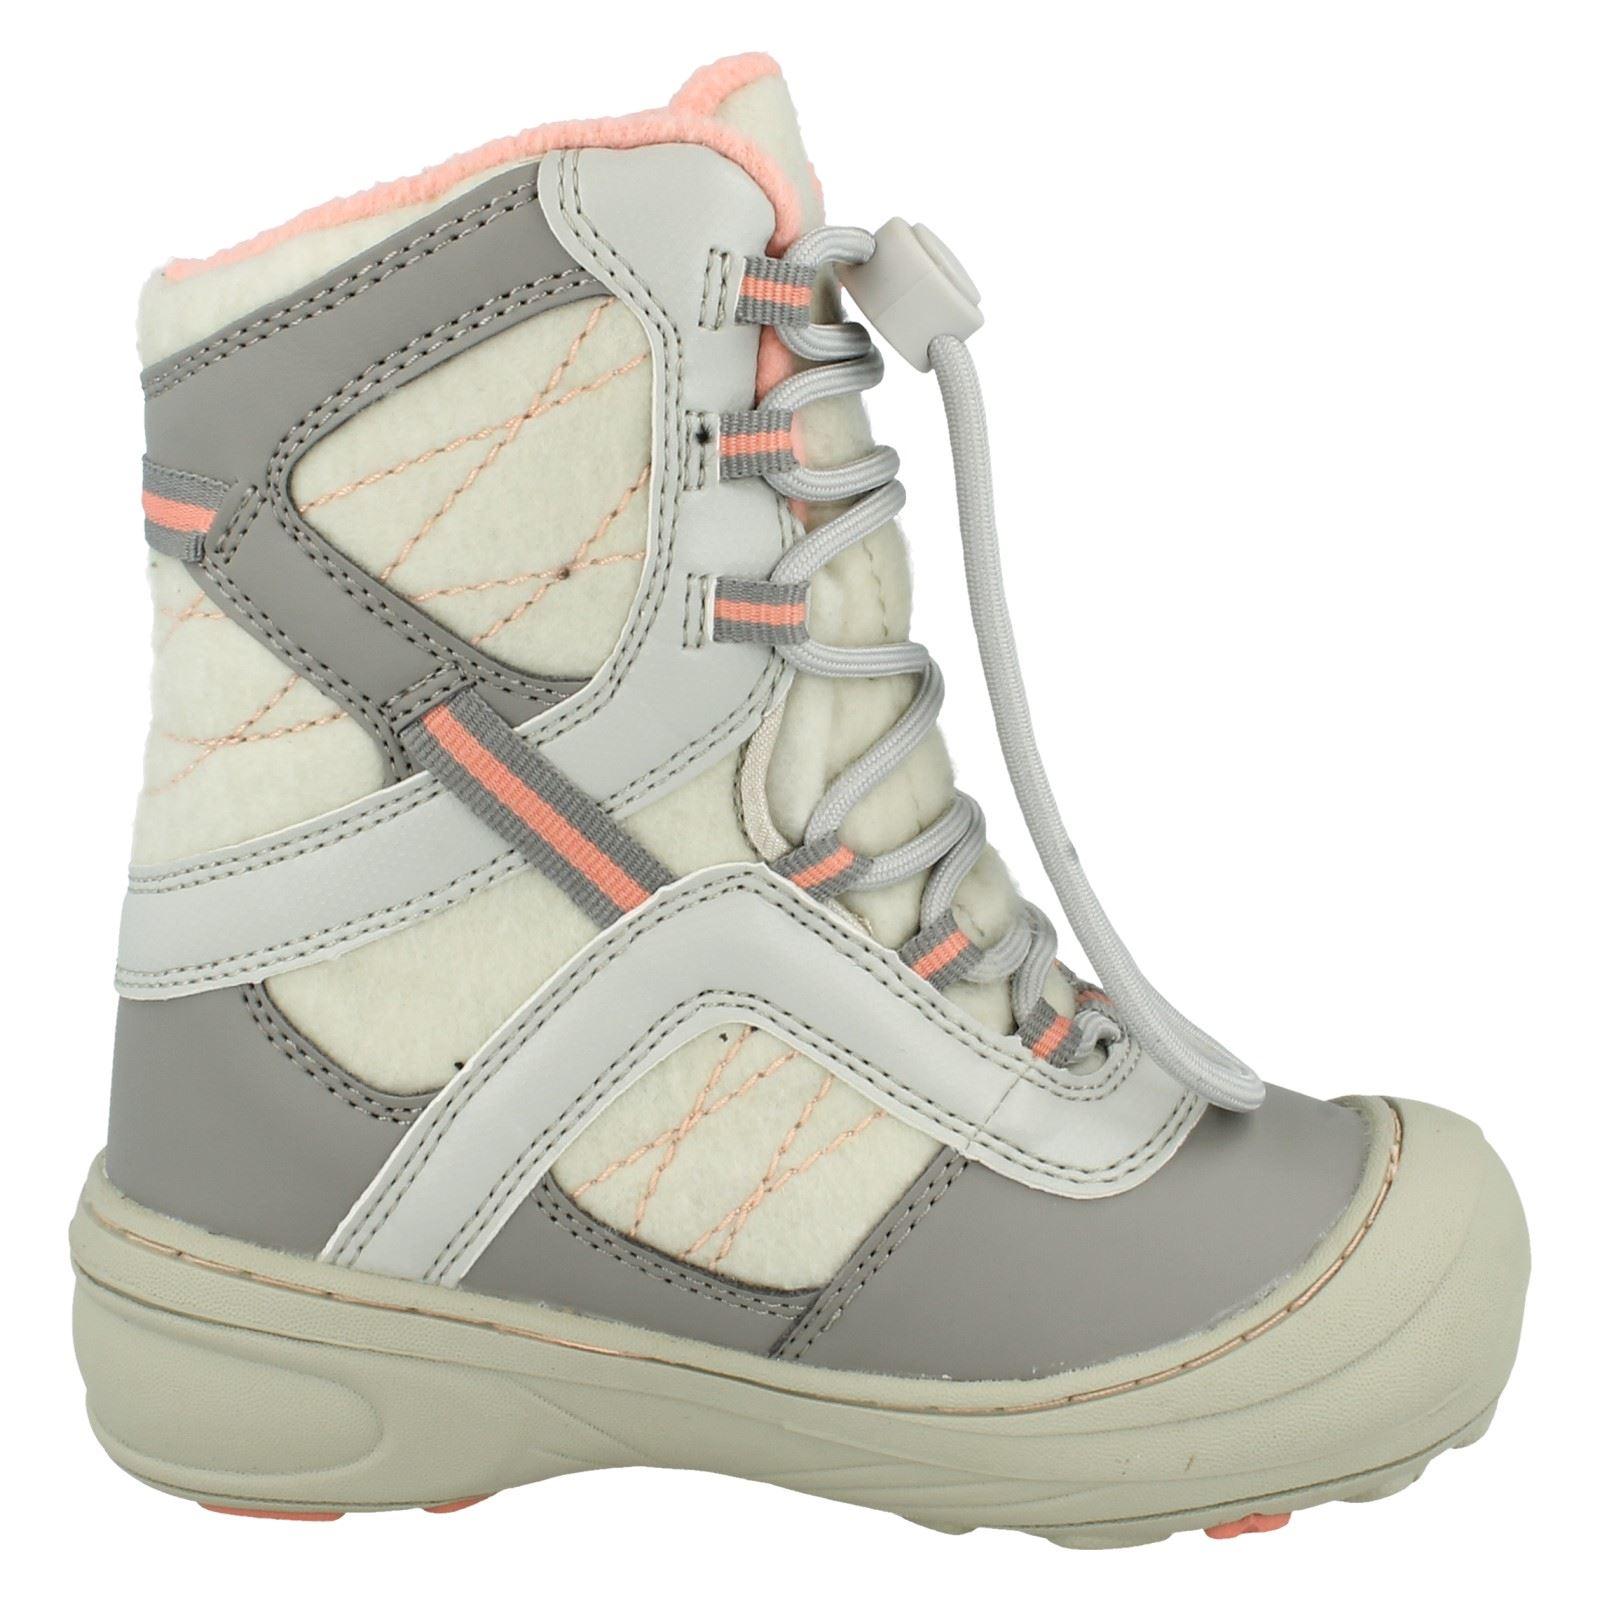 Girls Hi Tec Snow Boots Style - Slalom 200 WP JRG